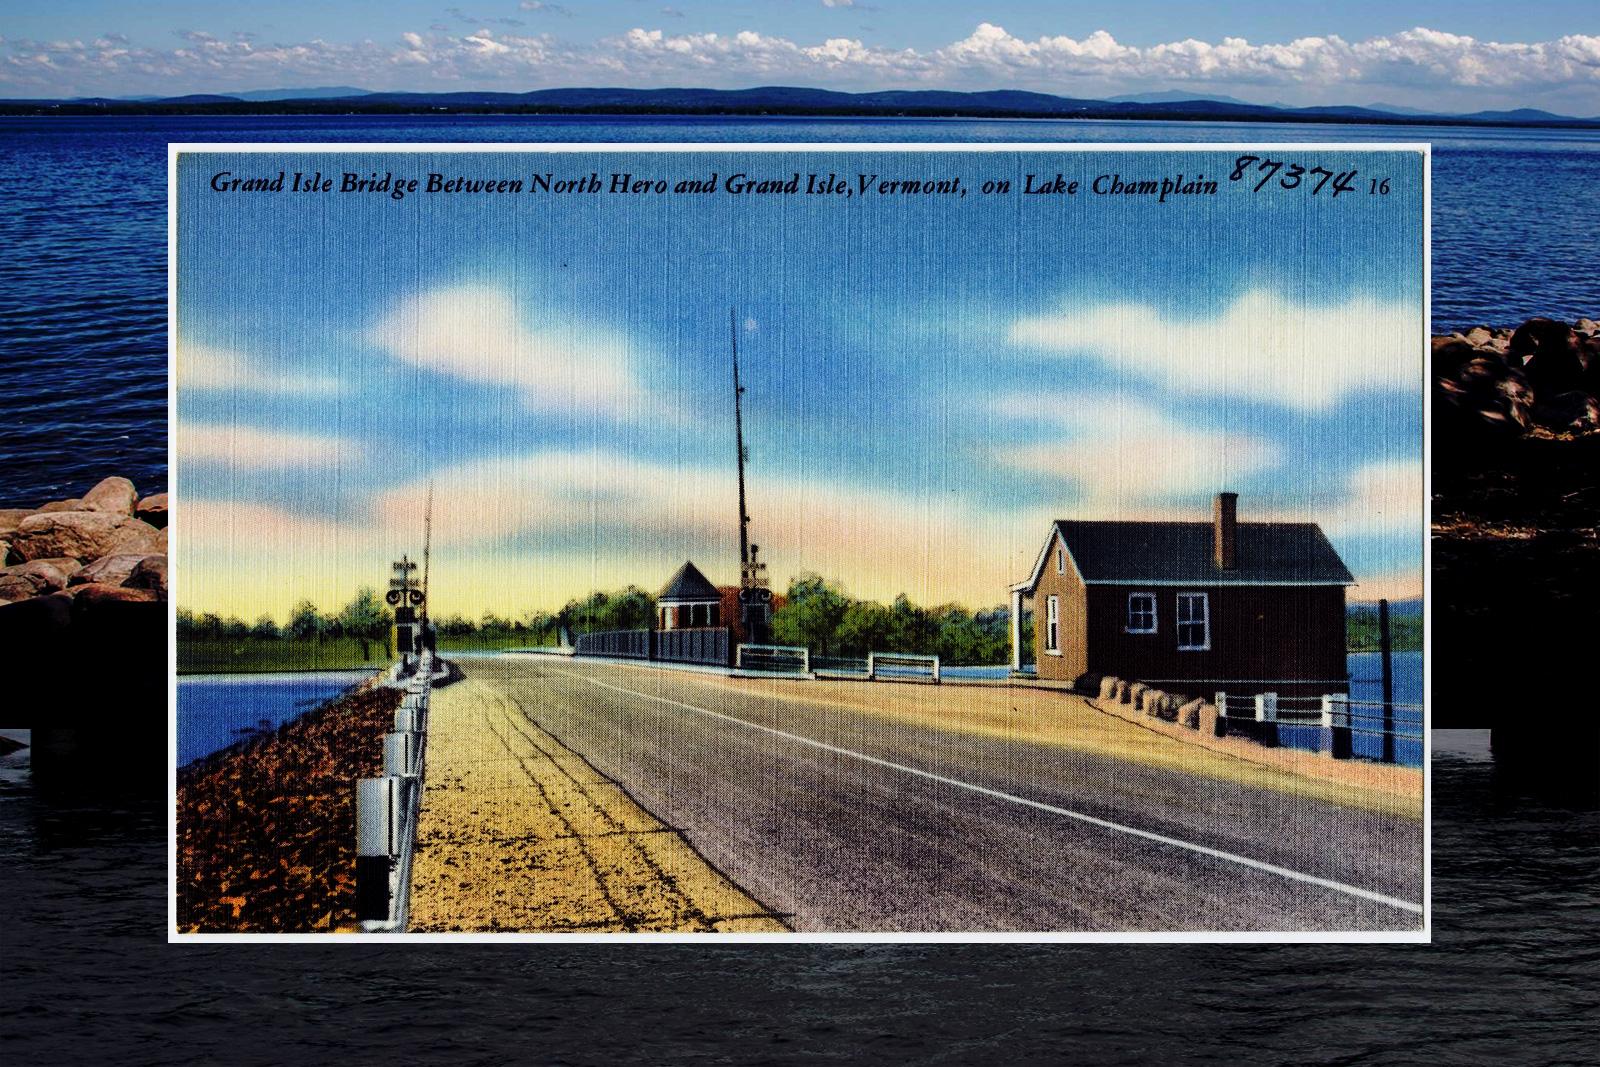 NHGI postcard